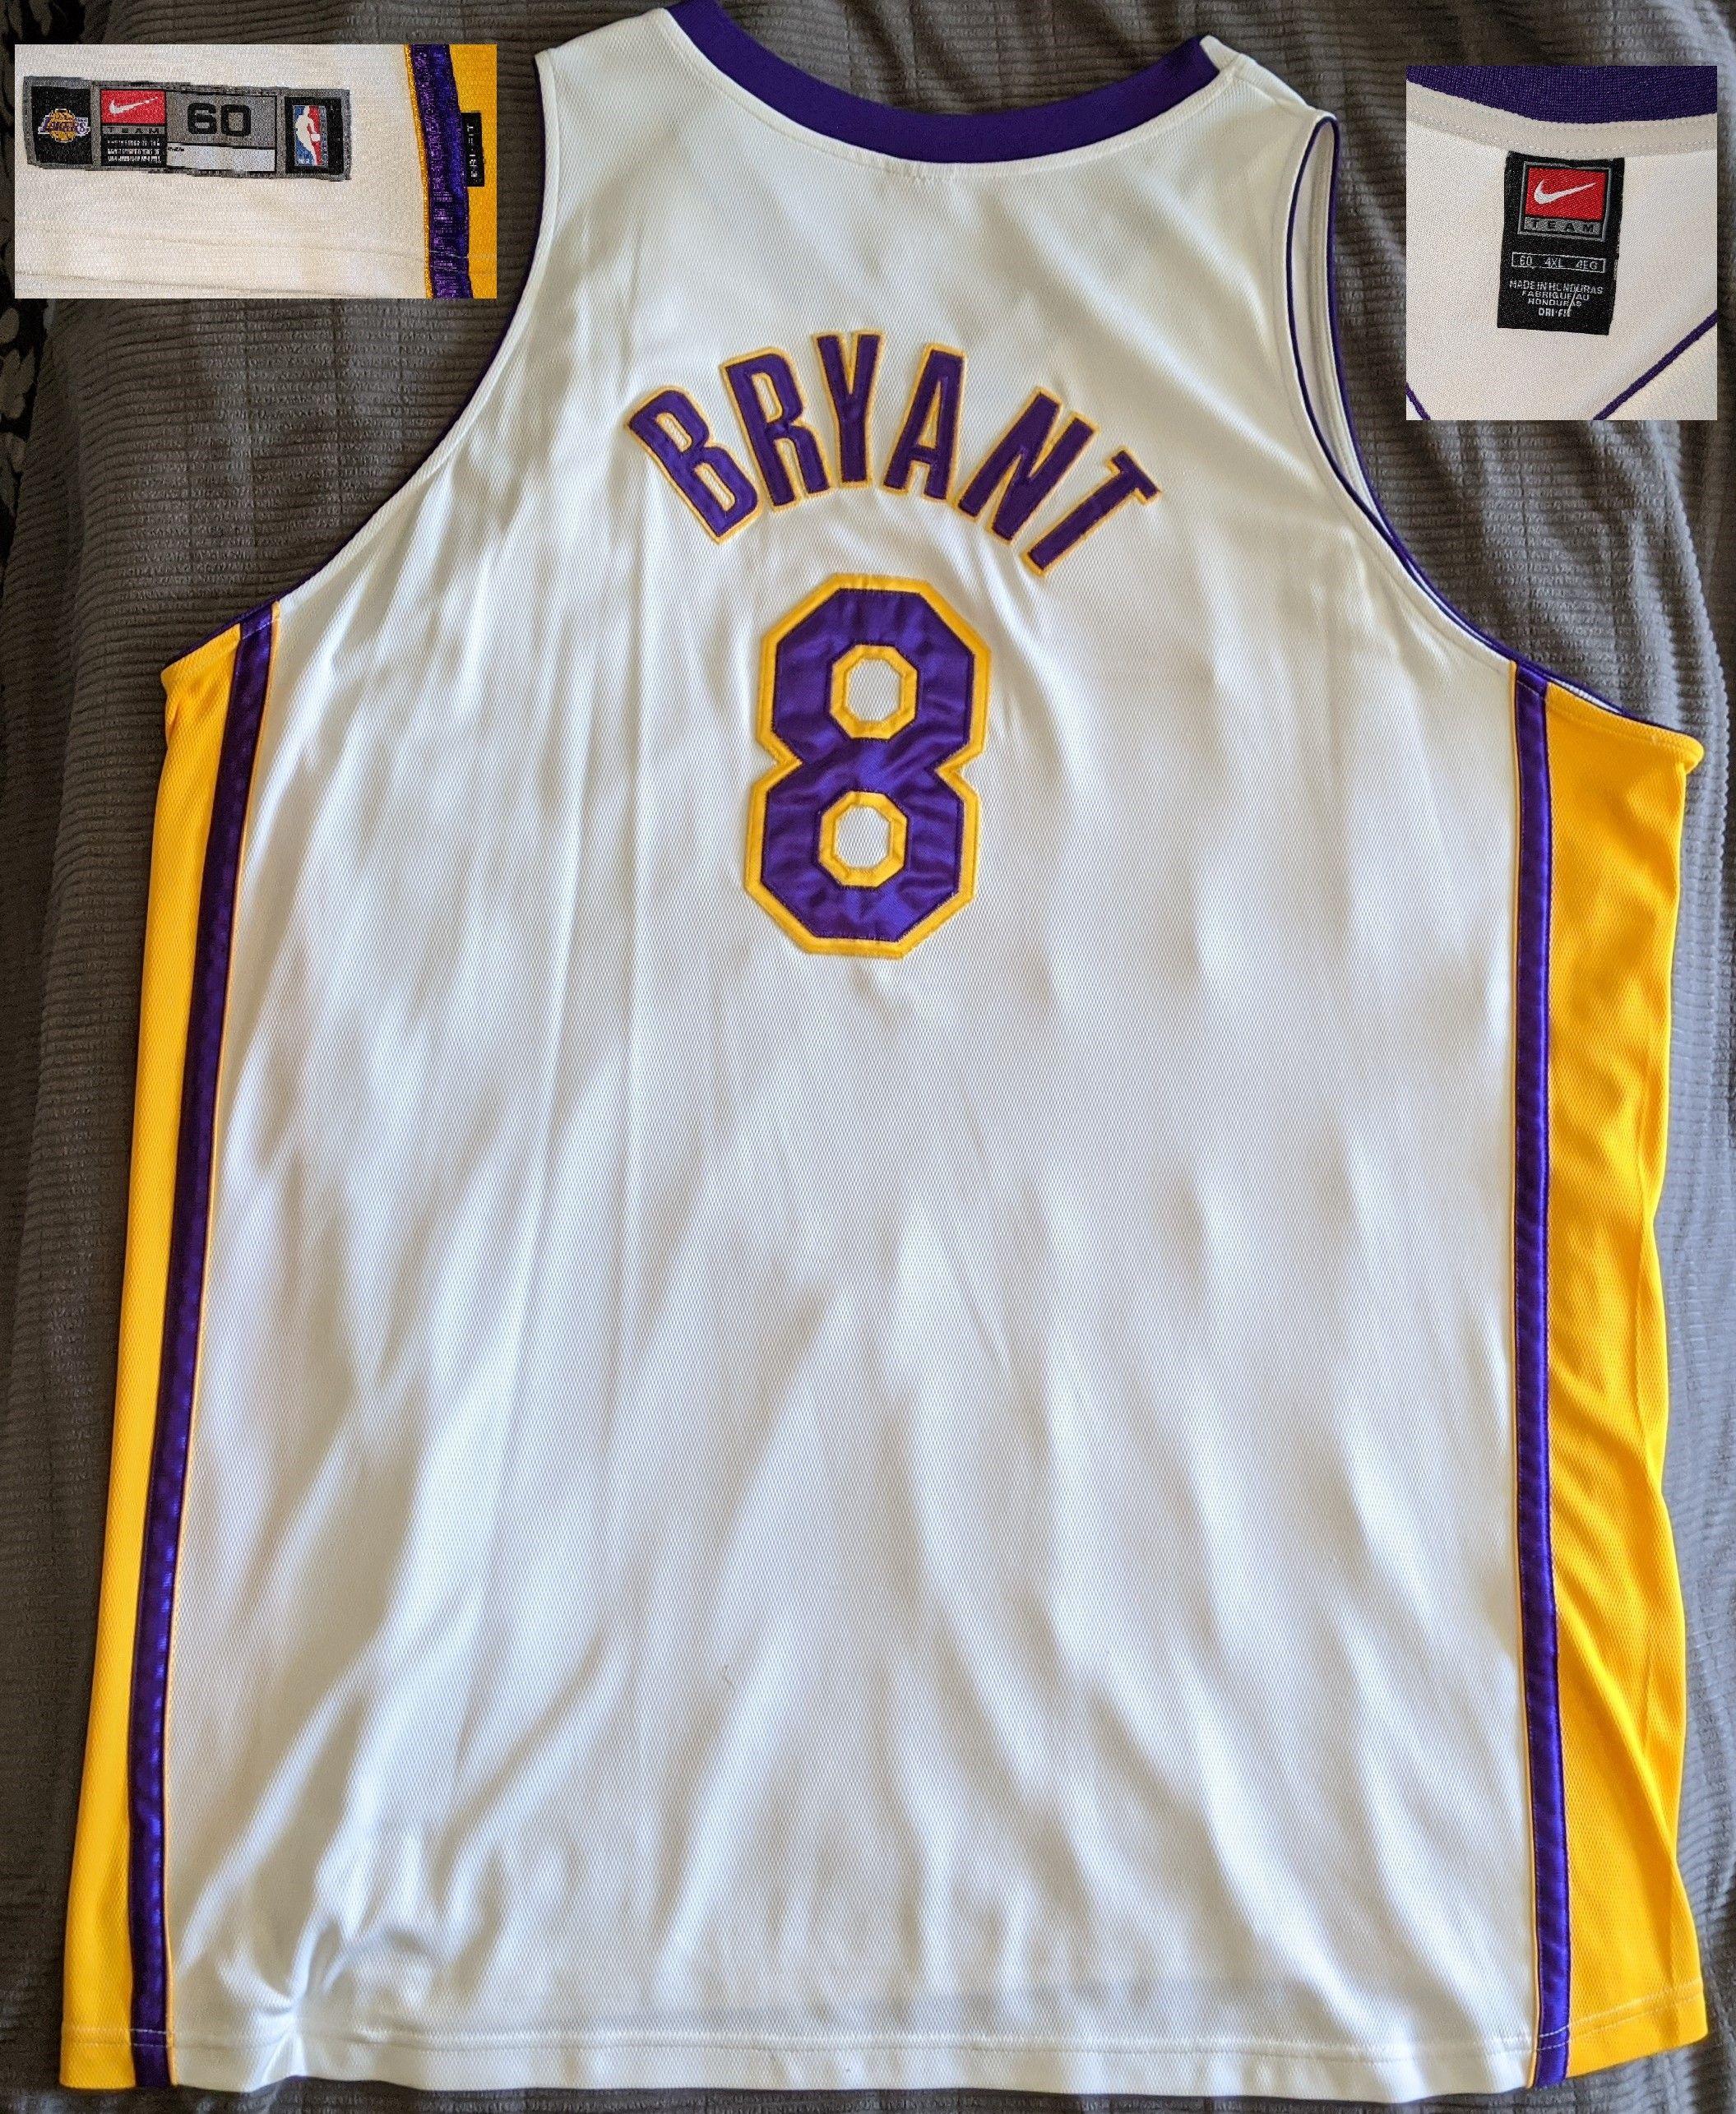 La Fabrique A Jersey : fabrique, jersey, Bryant, Jersey!, Lakers, Jersey,, Bryant,